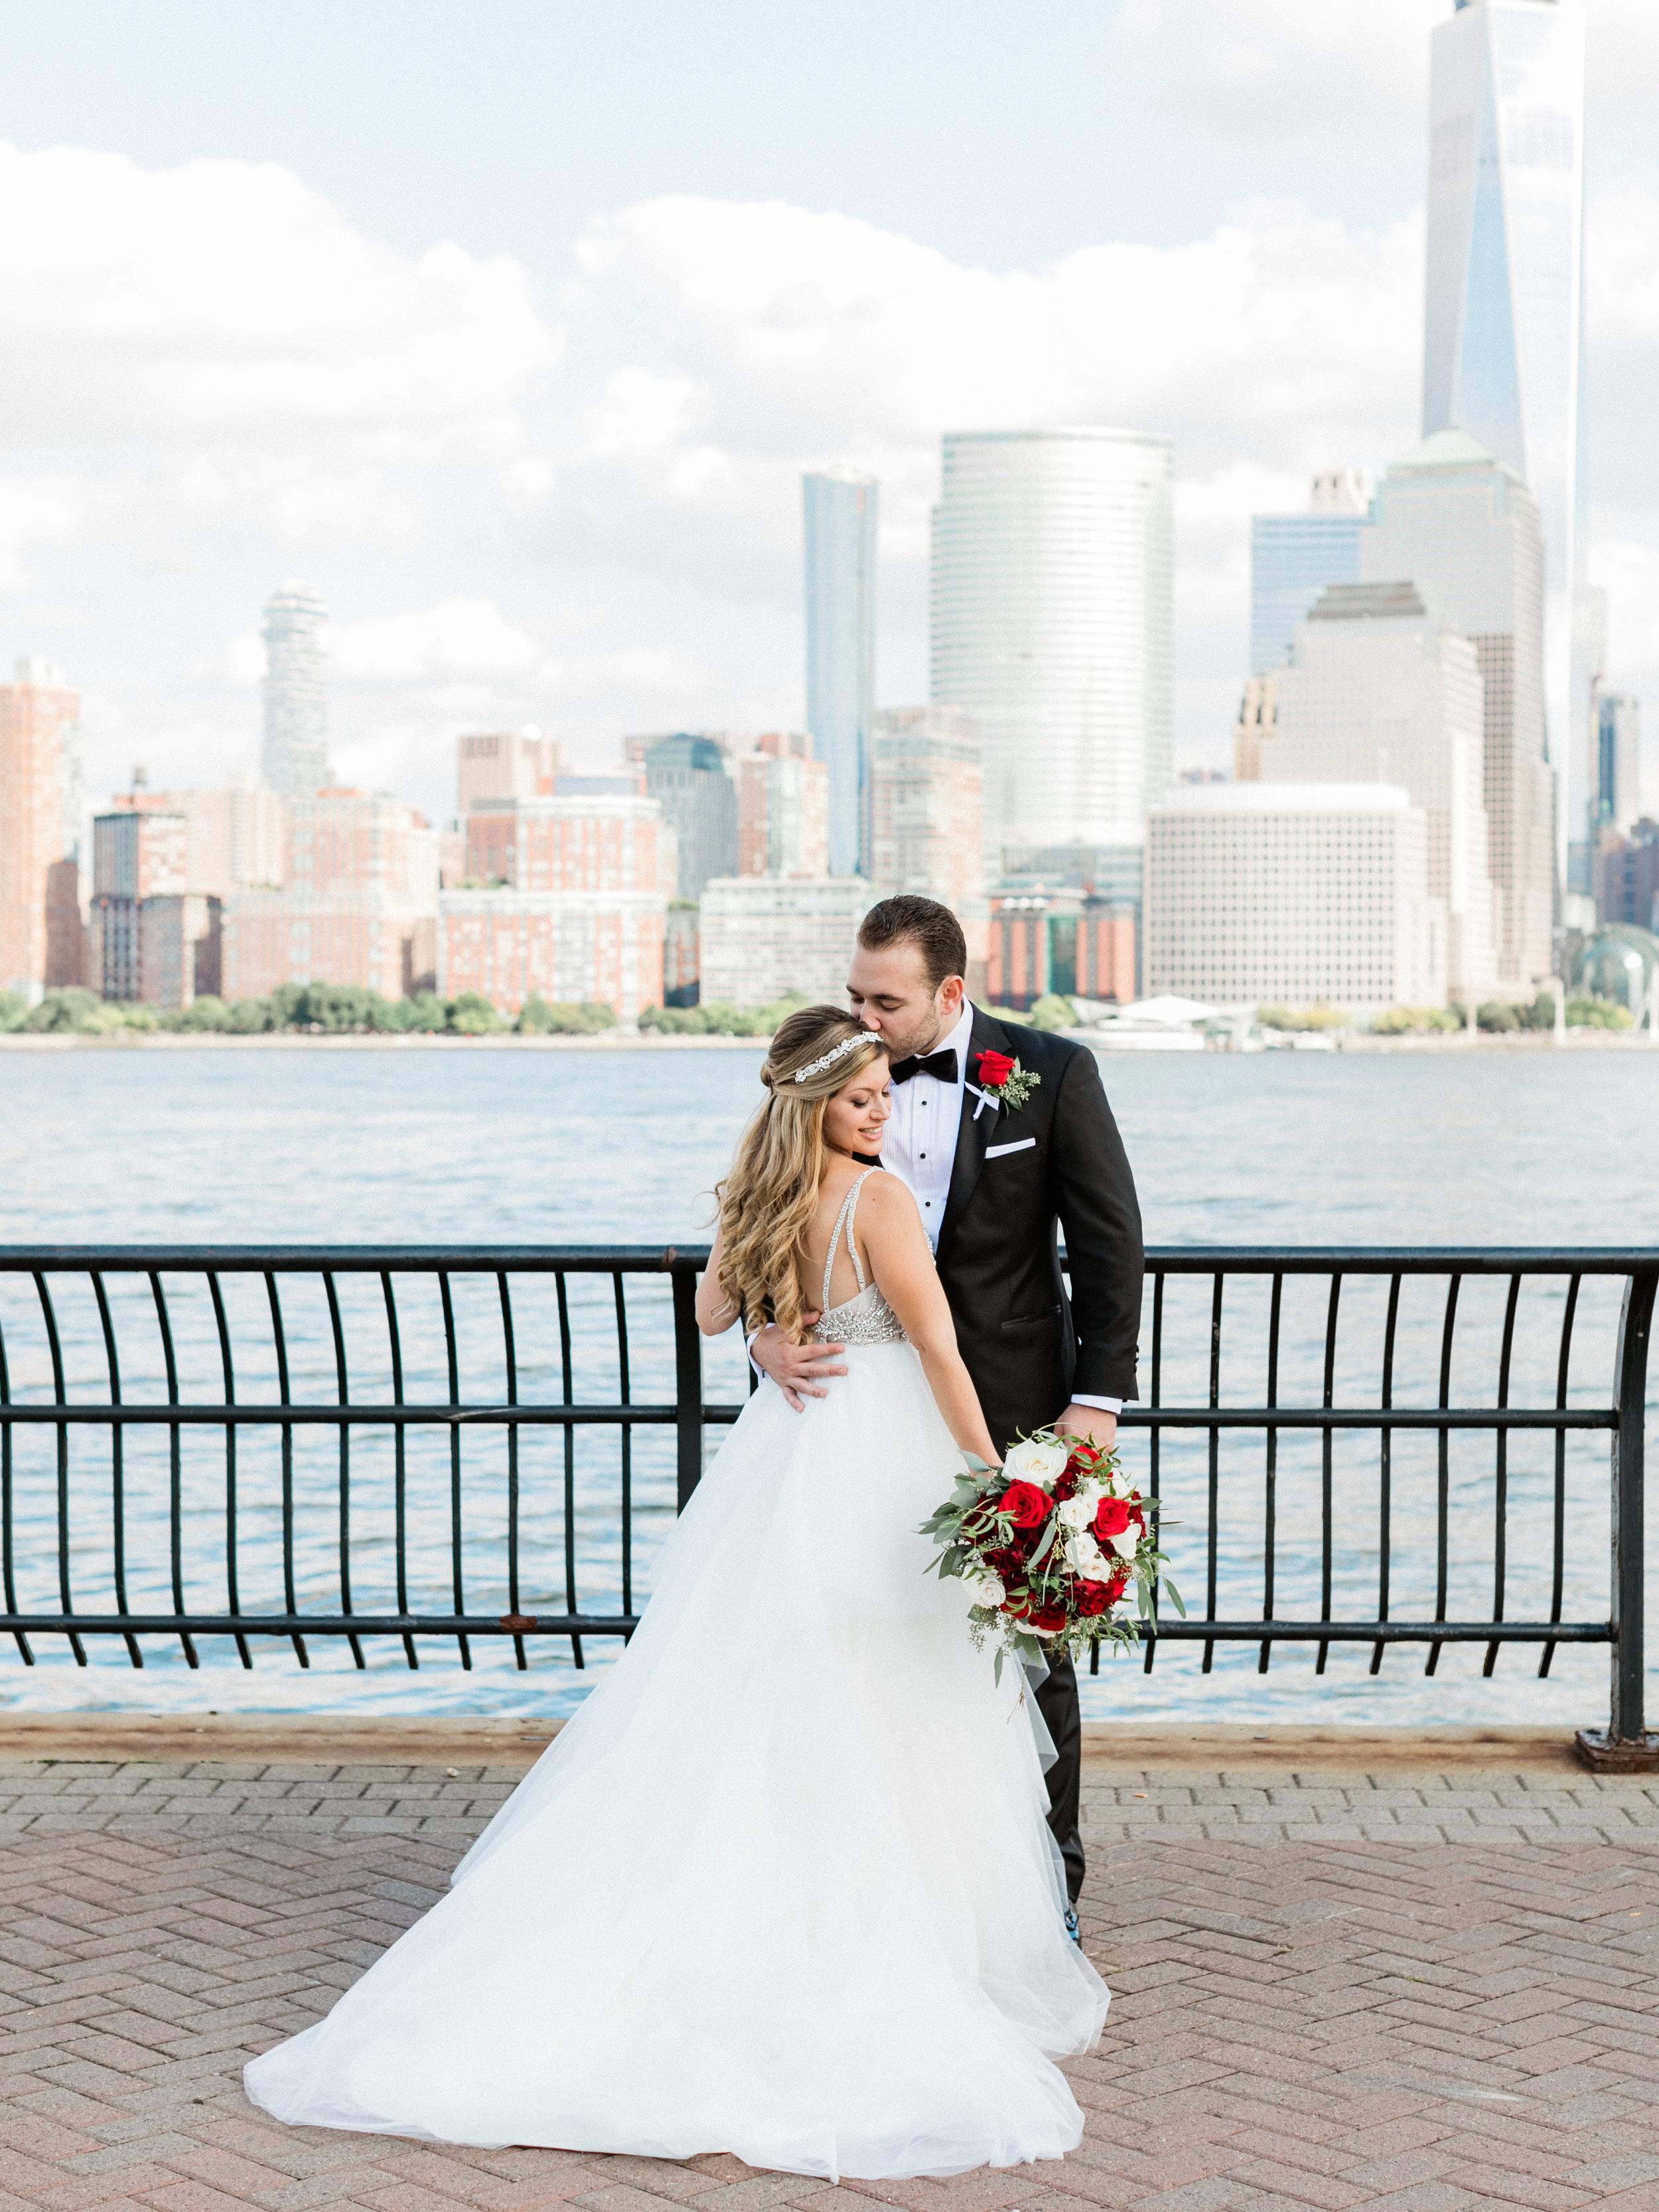 hyatt-regency-jersey-city-wedding-photographer34.jpg